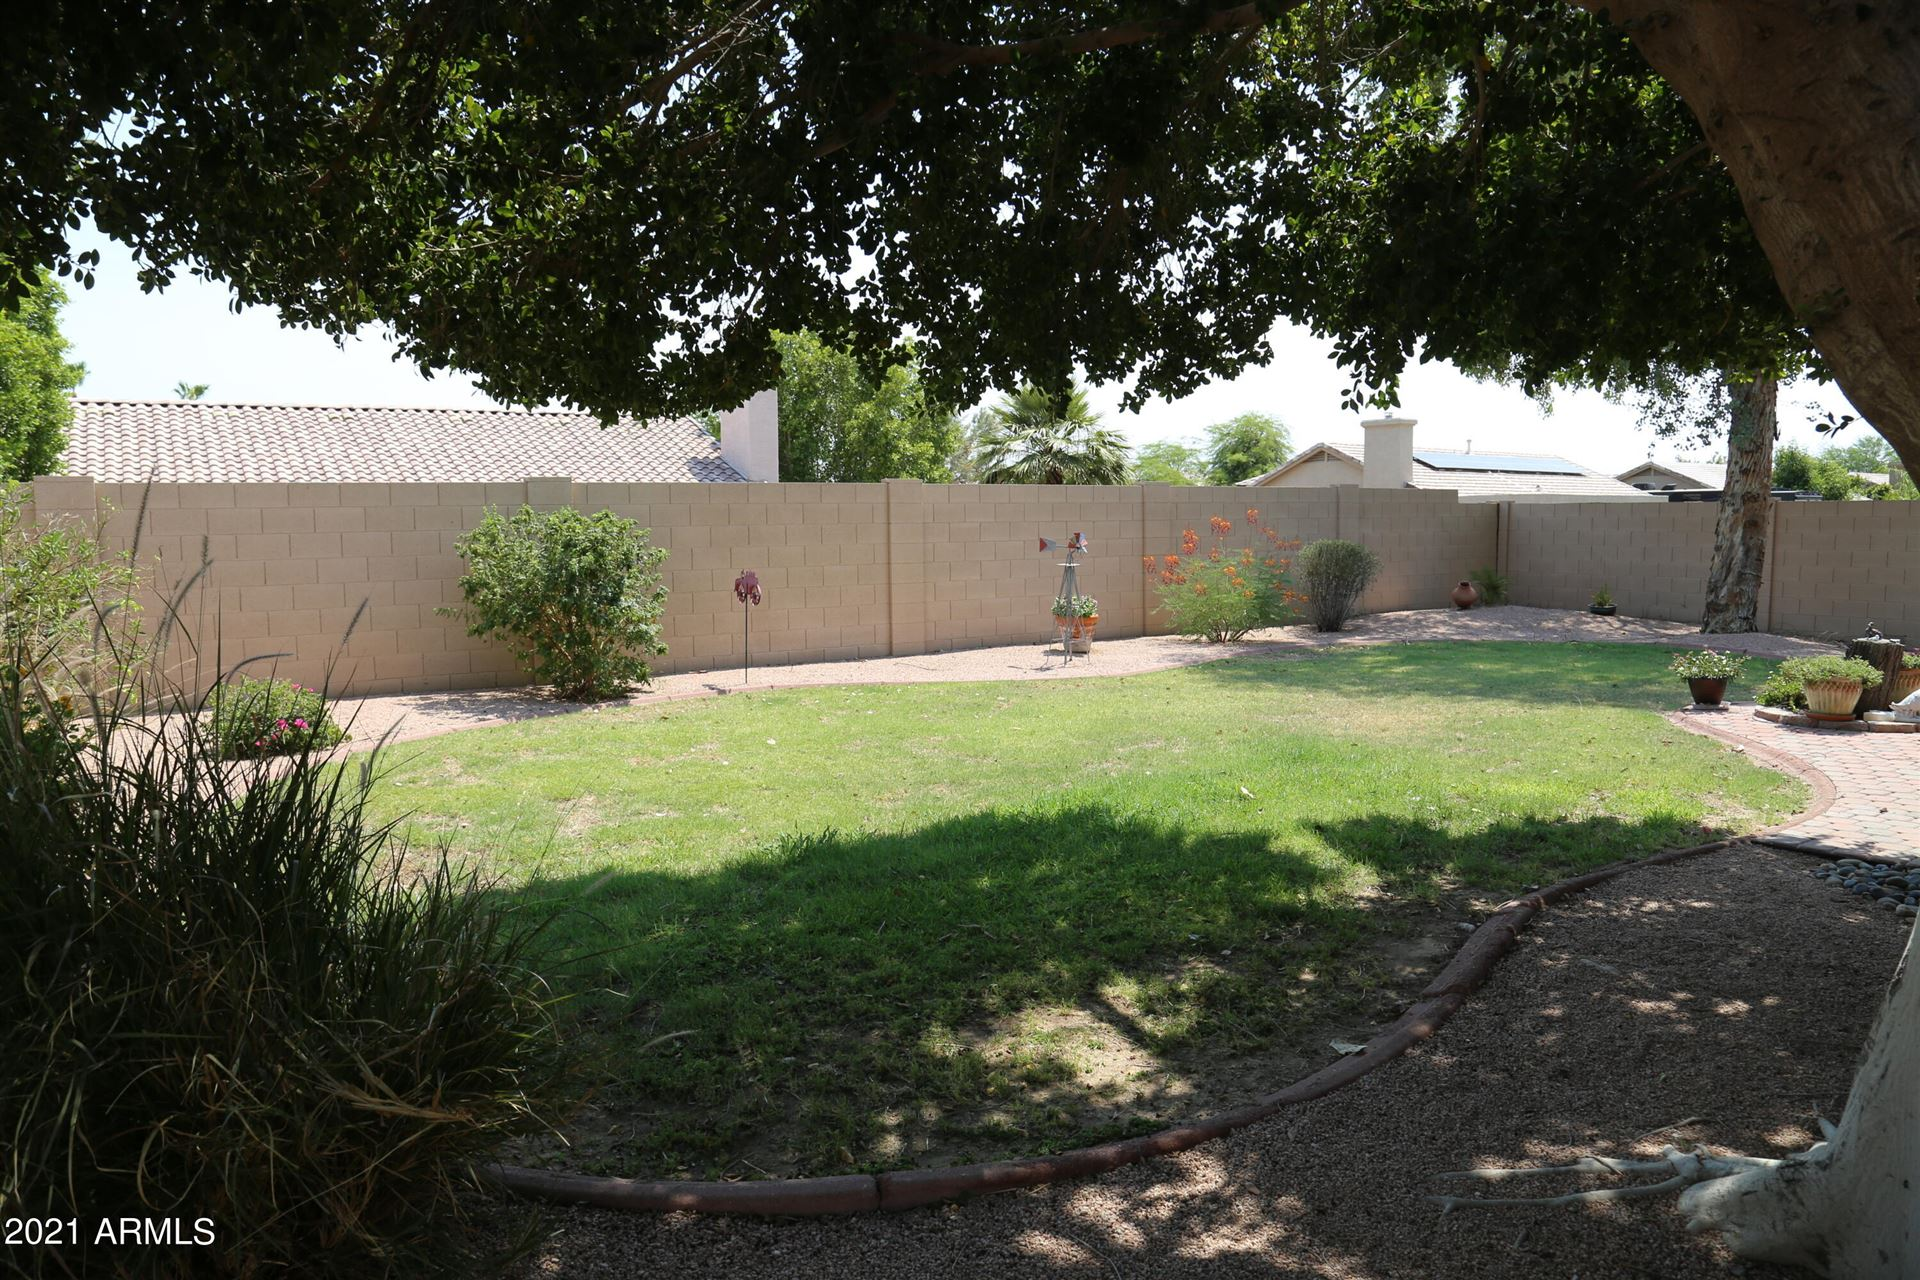 Photo of 6941 W MONTE LINDO --, Glendale, AZ 85310 (MLS # 6269299)